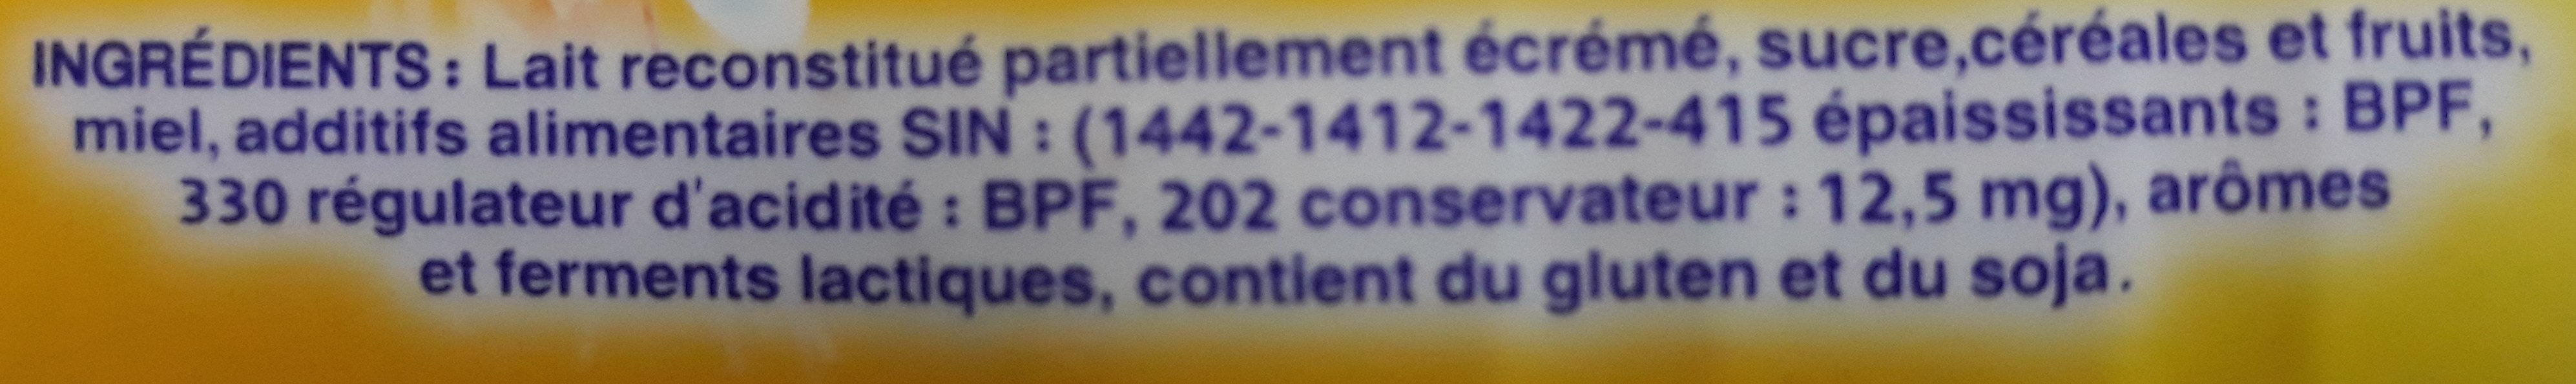 Cerealo - المكونات - fr